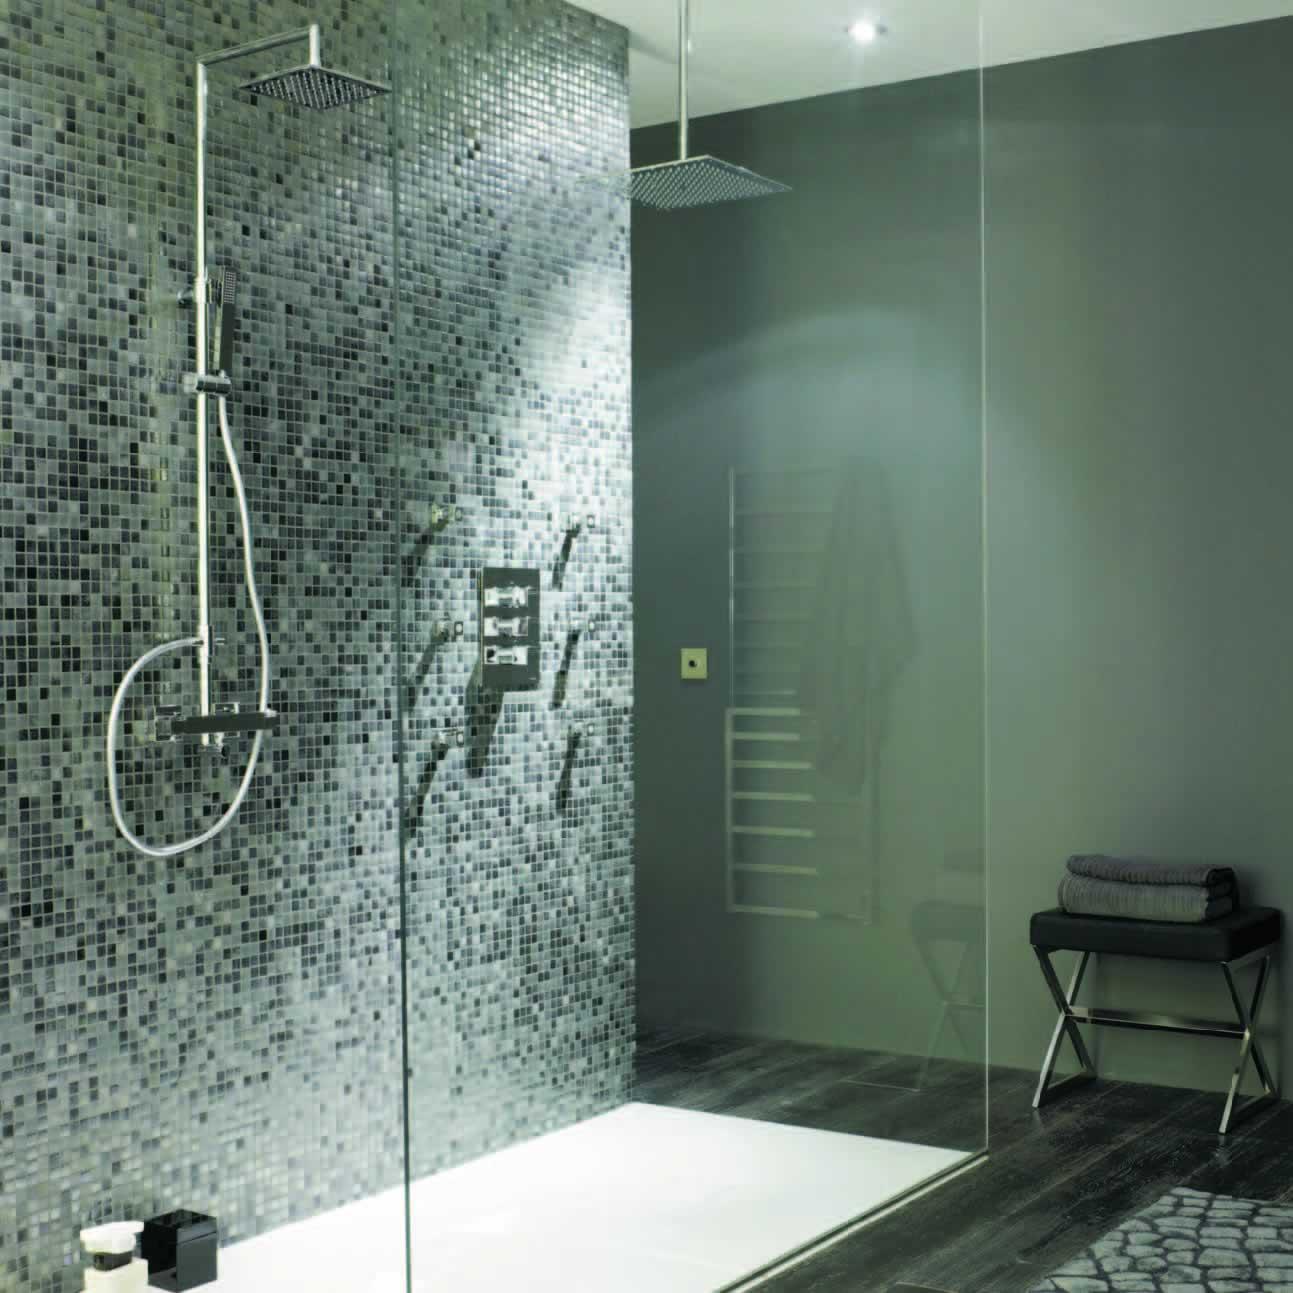 Mosaicos vitreos de alta calidad - Mosaicos para banos ...